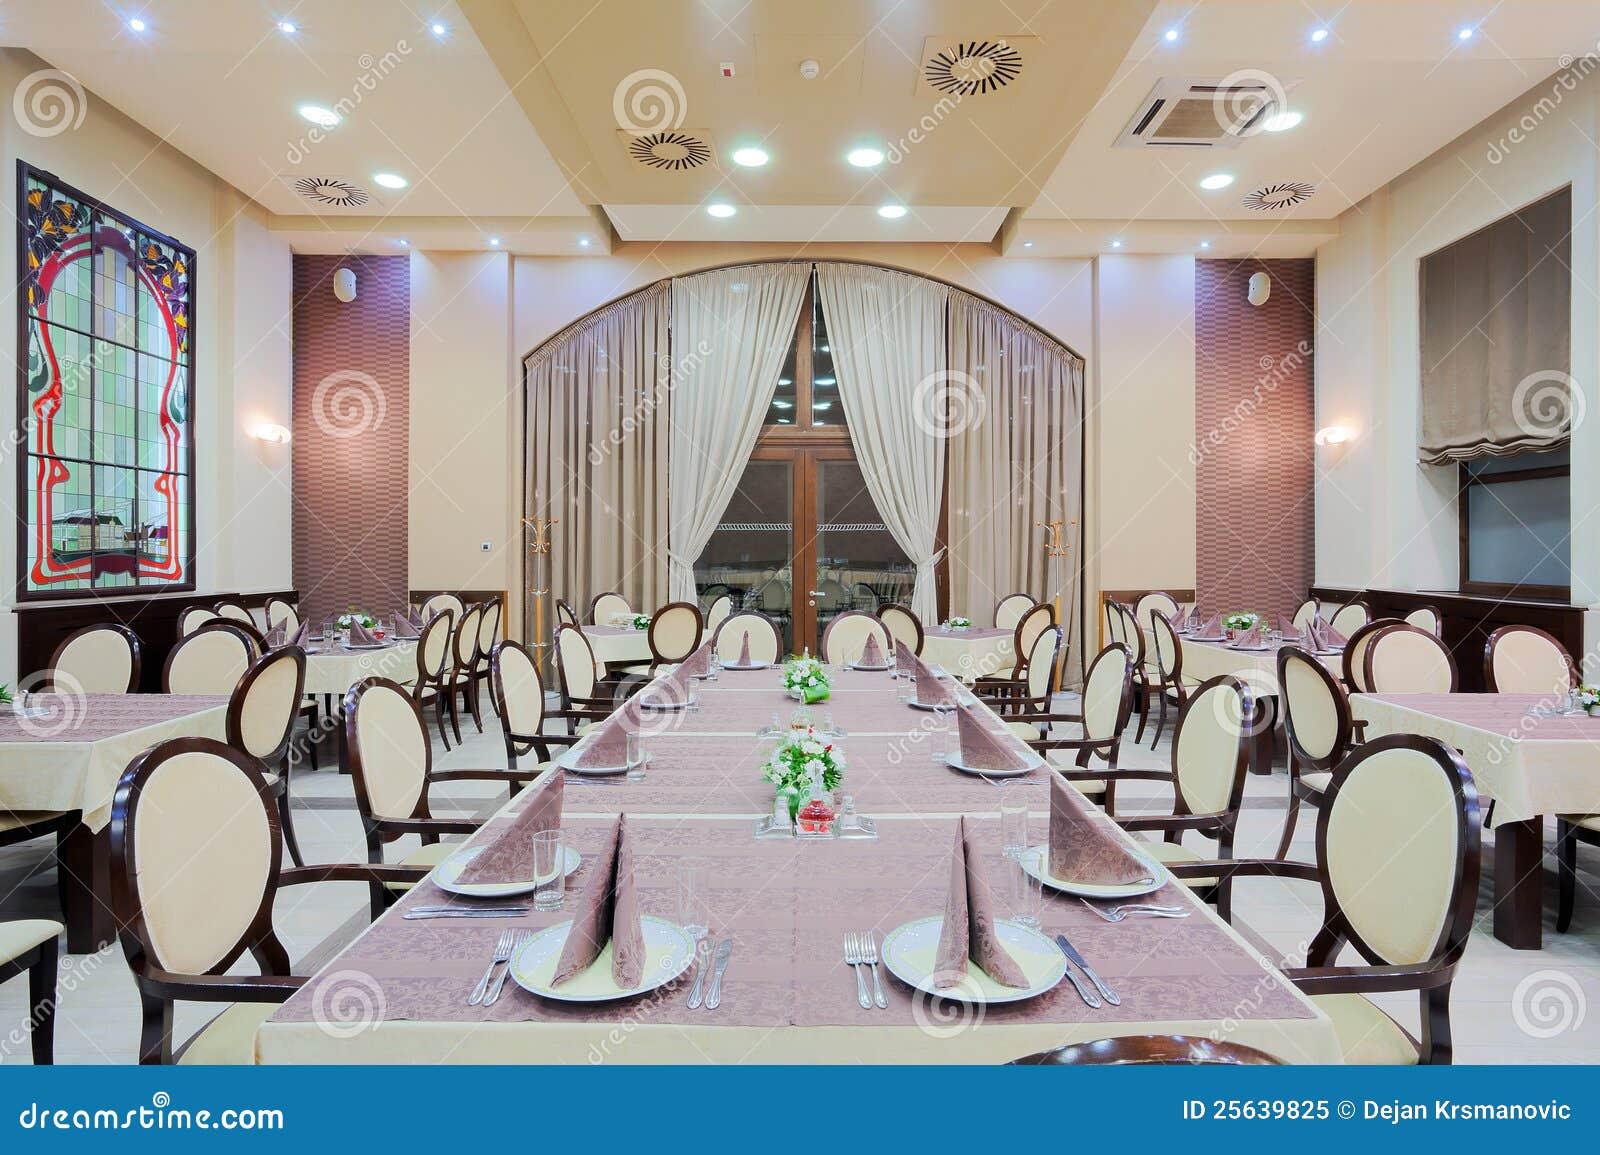 interior modern large restaurant large windows stock photos